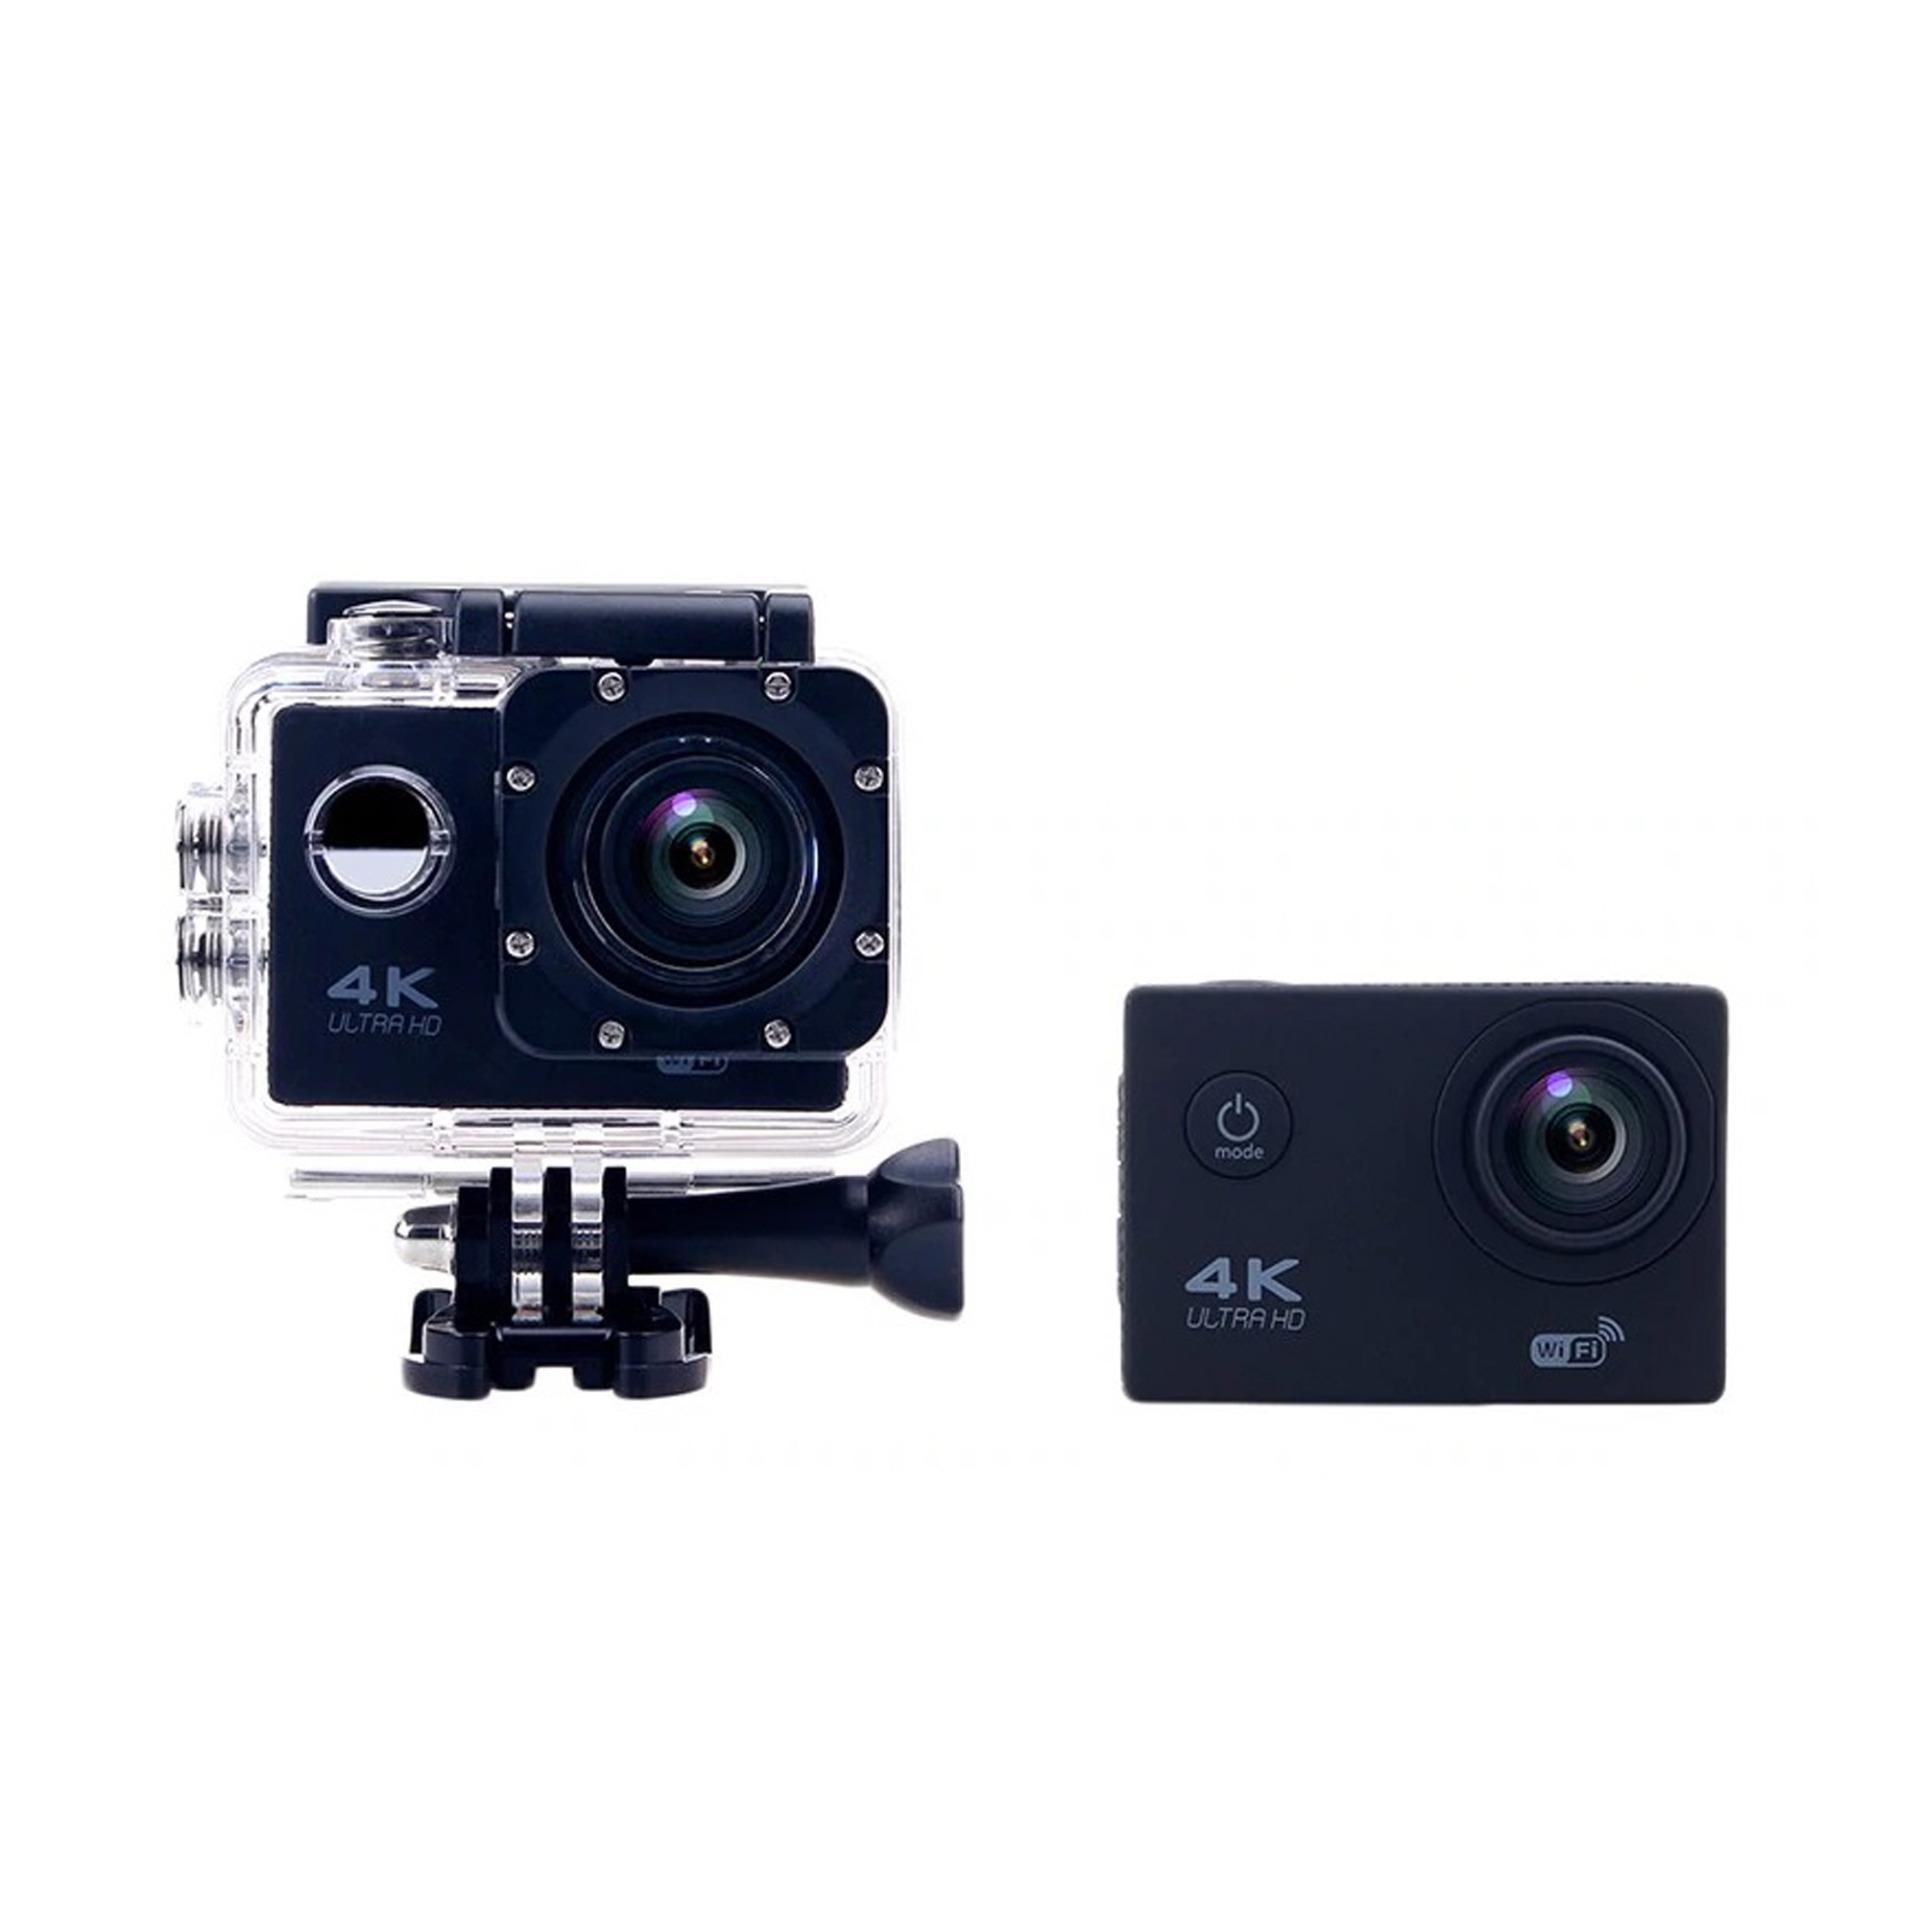 Kamera Kogan Terbaru Termurah Hot Deals Action Camera 4k Nv Ultrahd 16mp Putih Wifi Gopro Sports